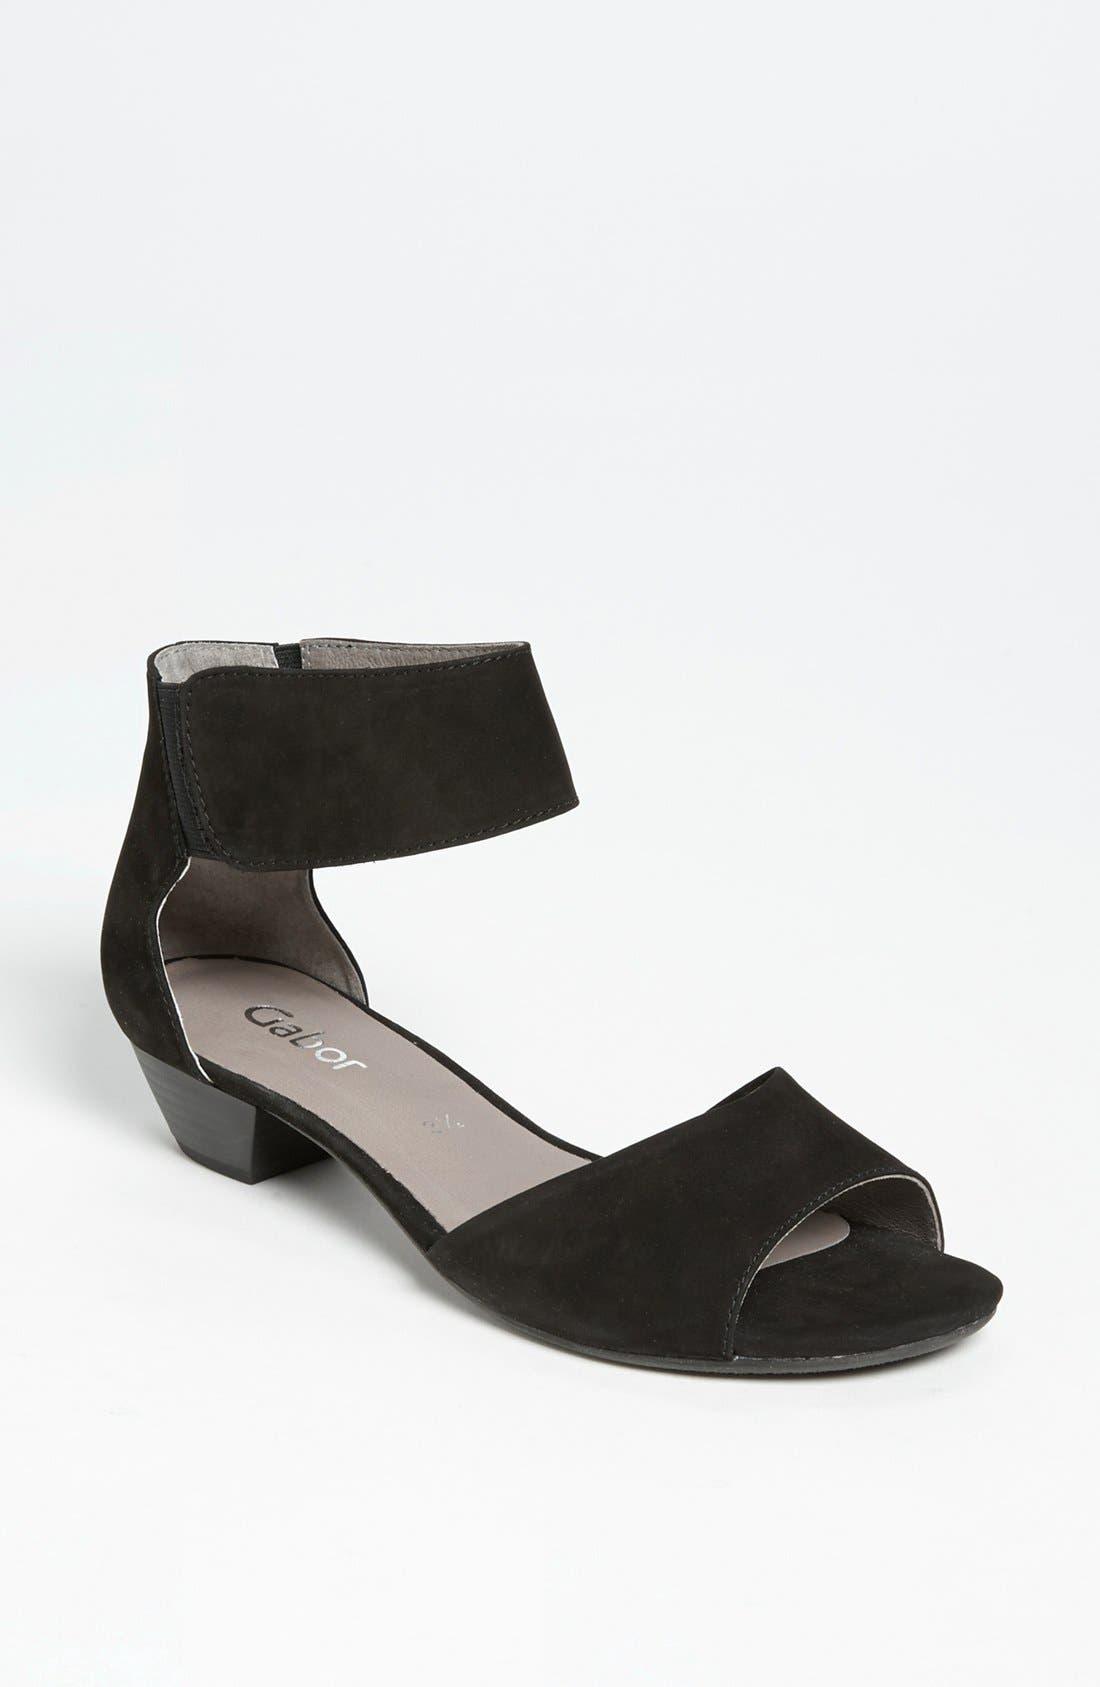 Alternate Image 1 Selected - Gabor Sandal (Online Only)